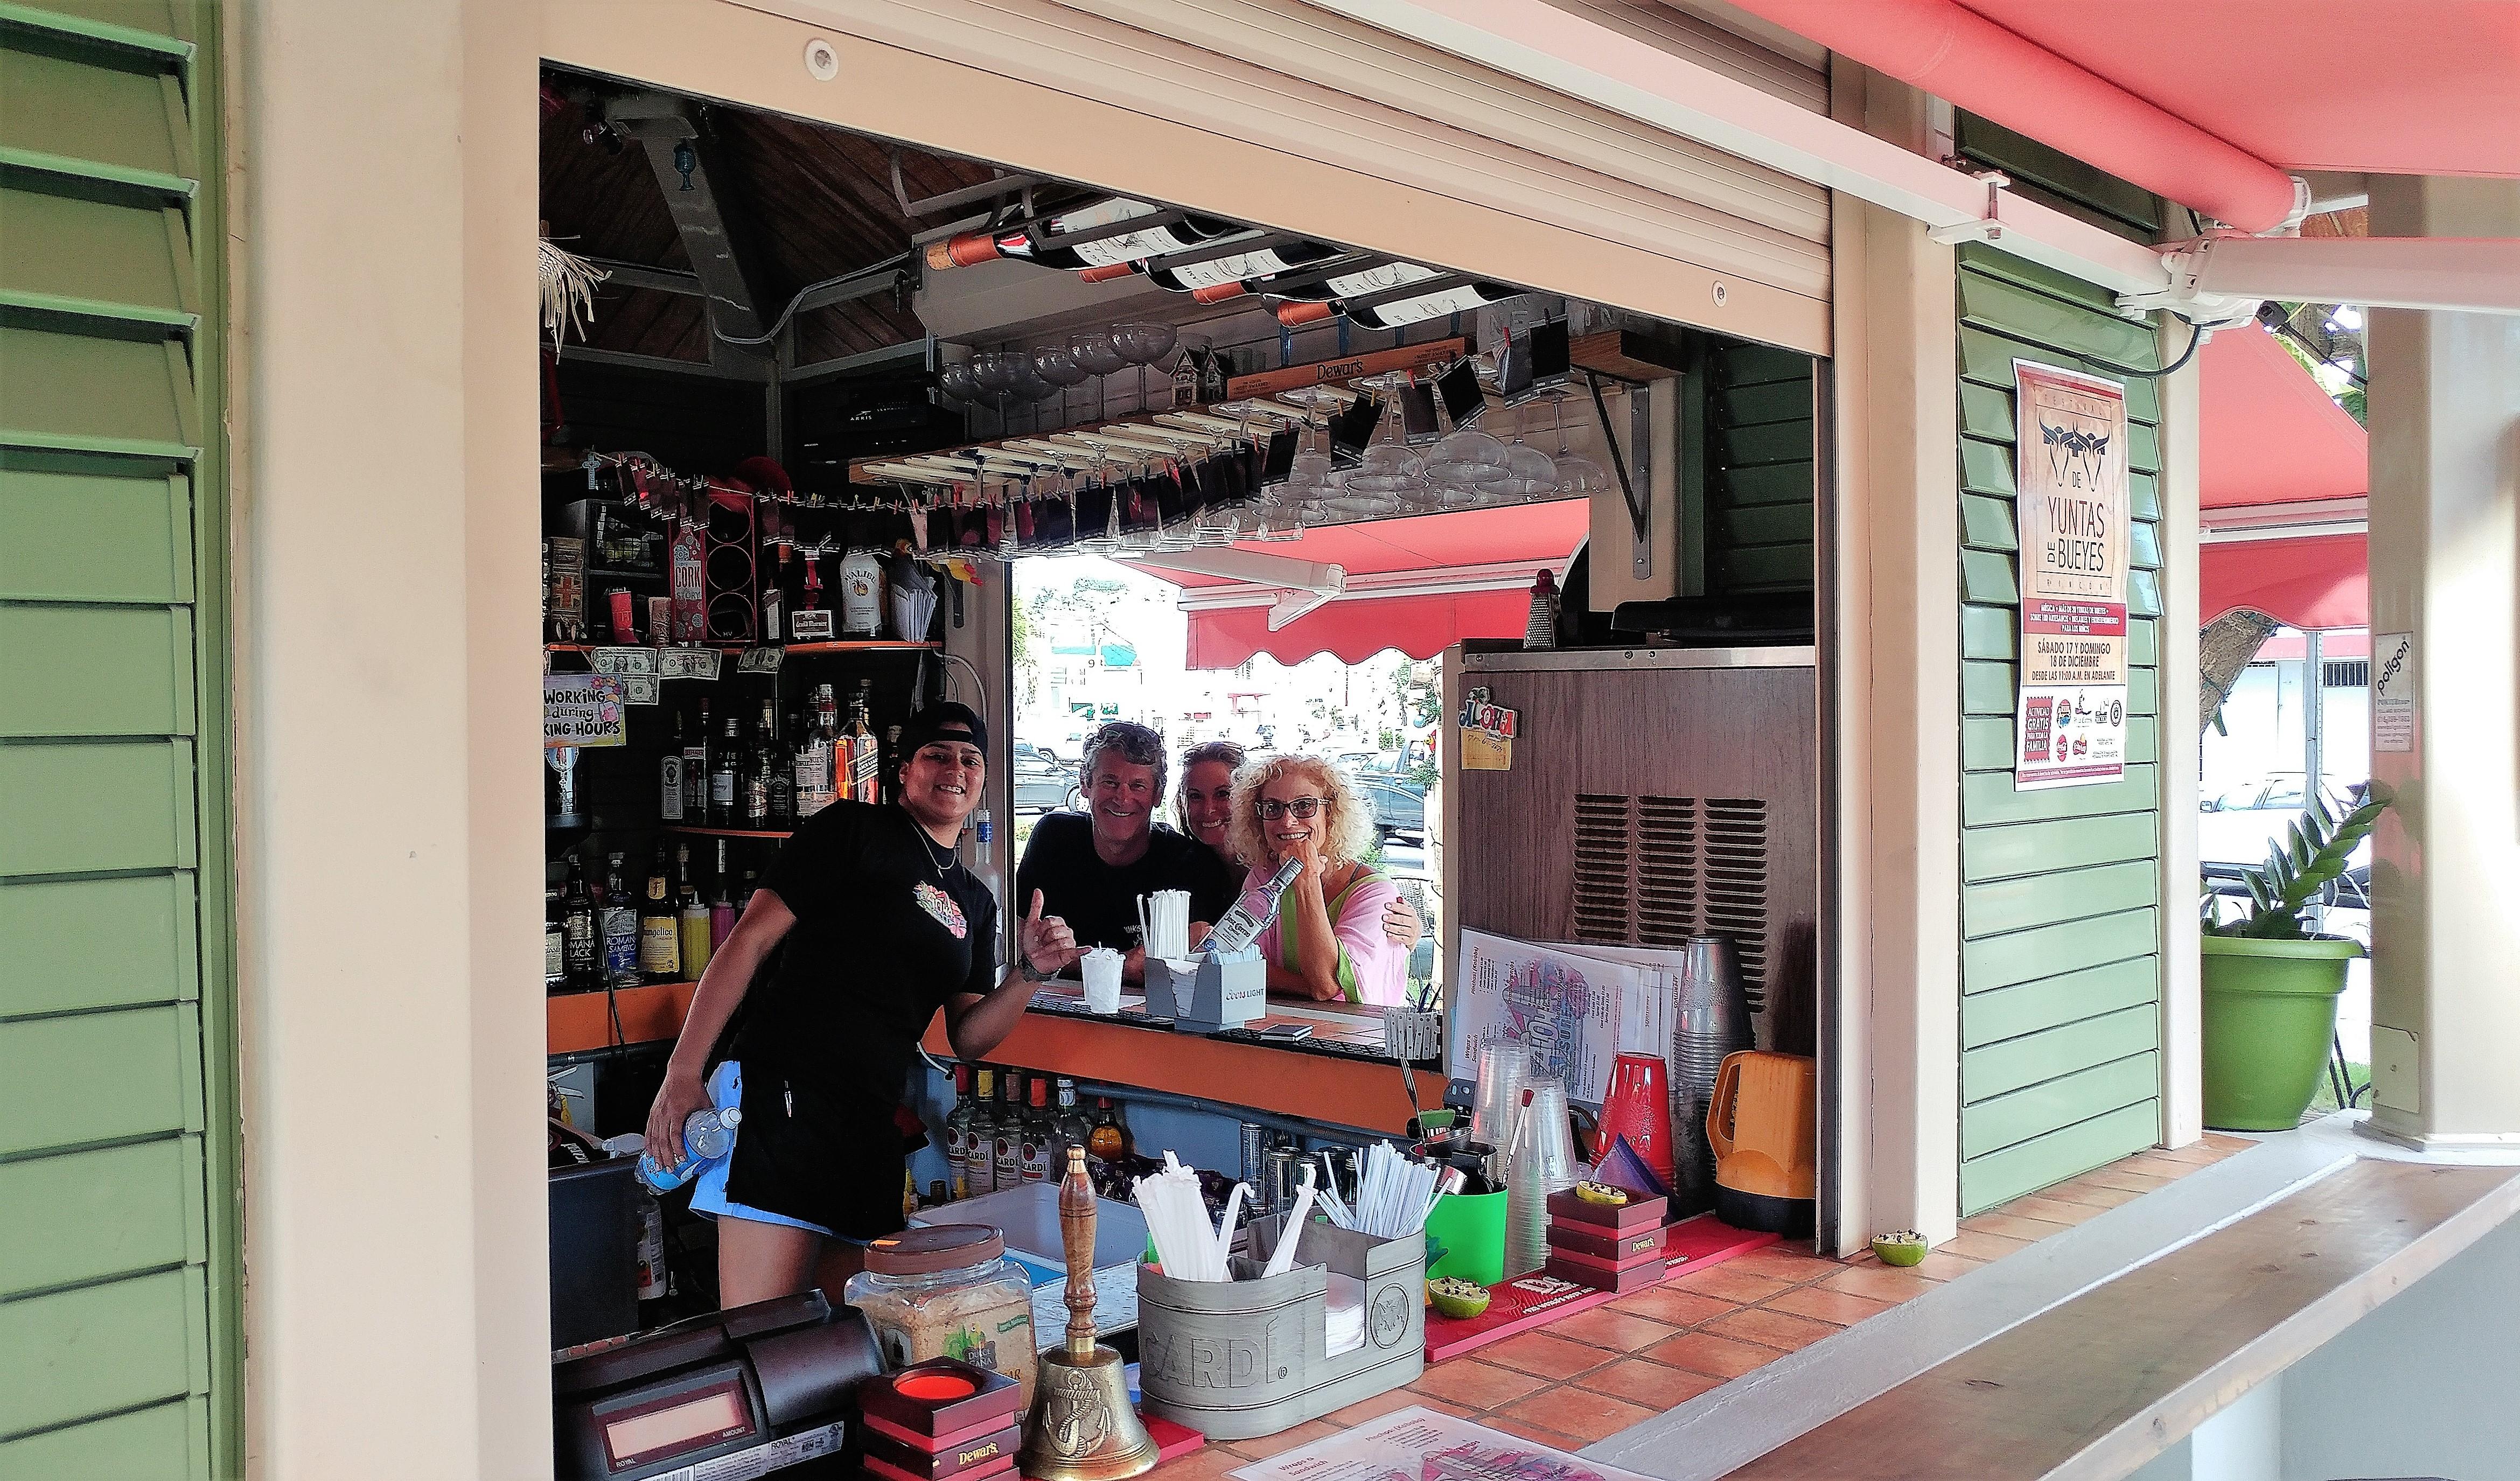 local curbside restaurant in Rincon, PR